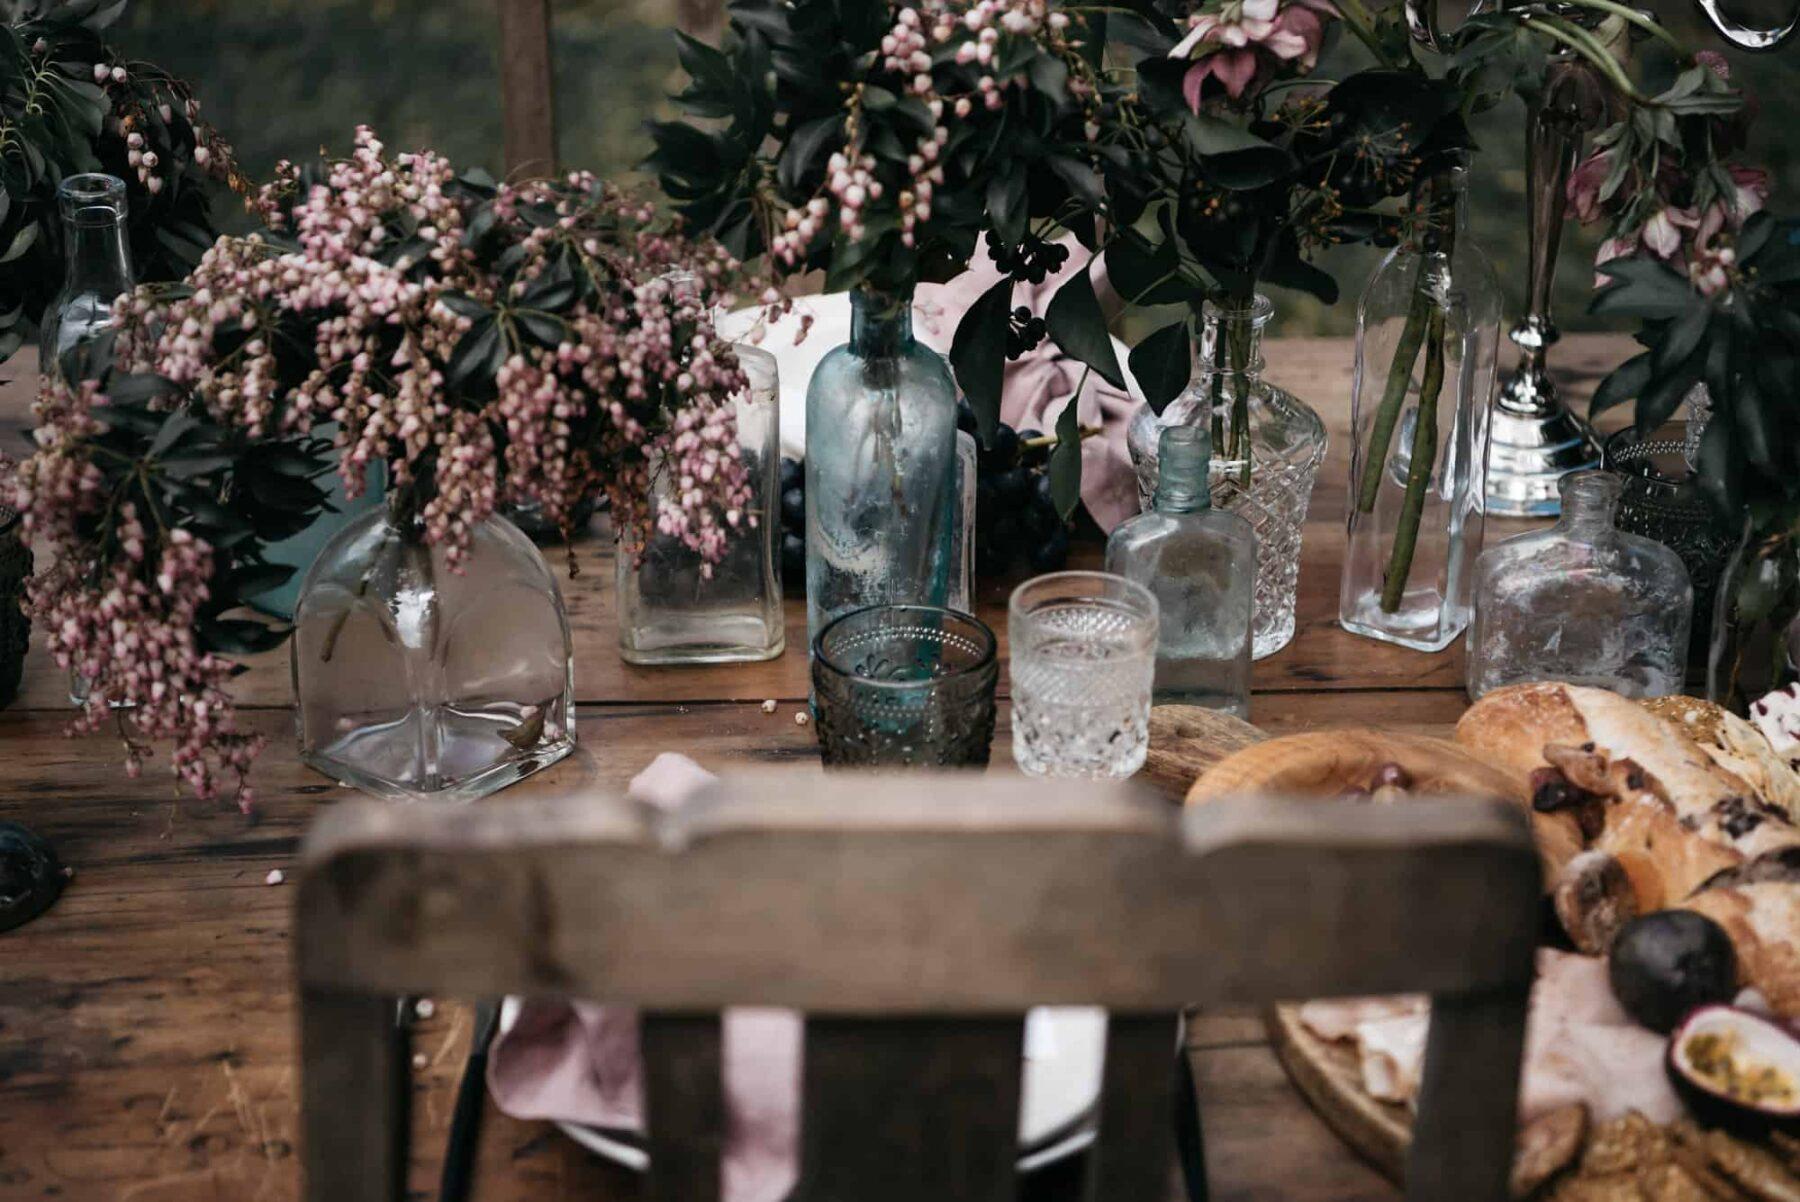 Textural tablescape in rich, warm tones